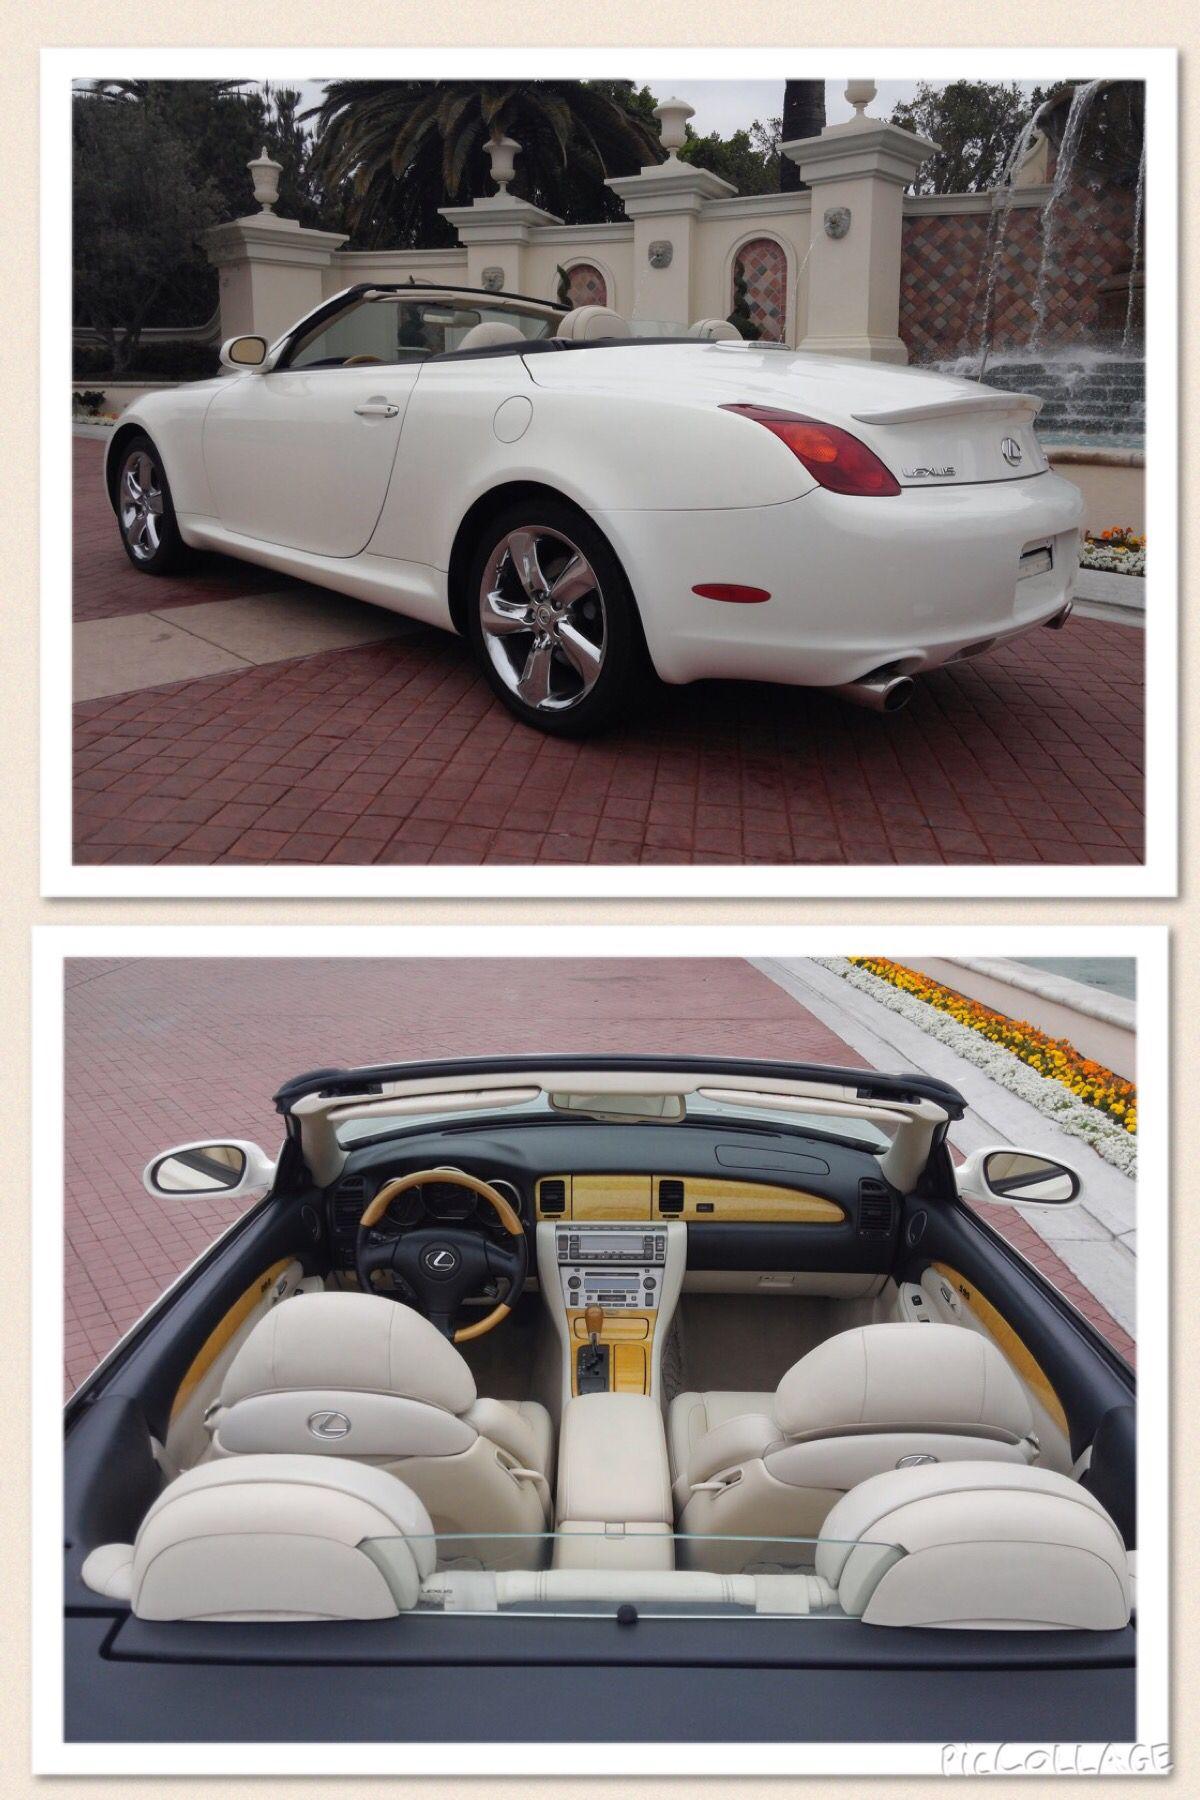 New Lexus SC 430 owner Club Lexus Forums